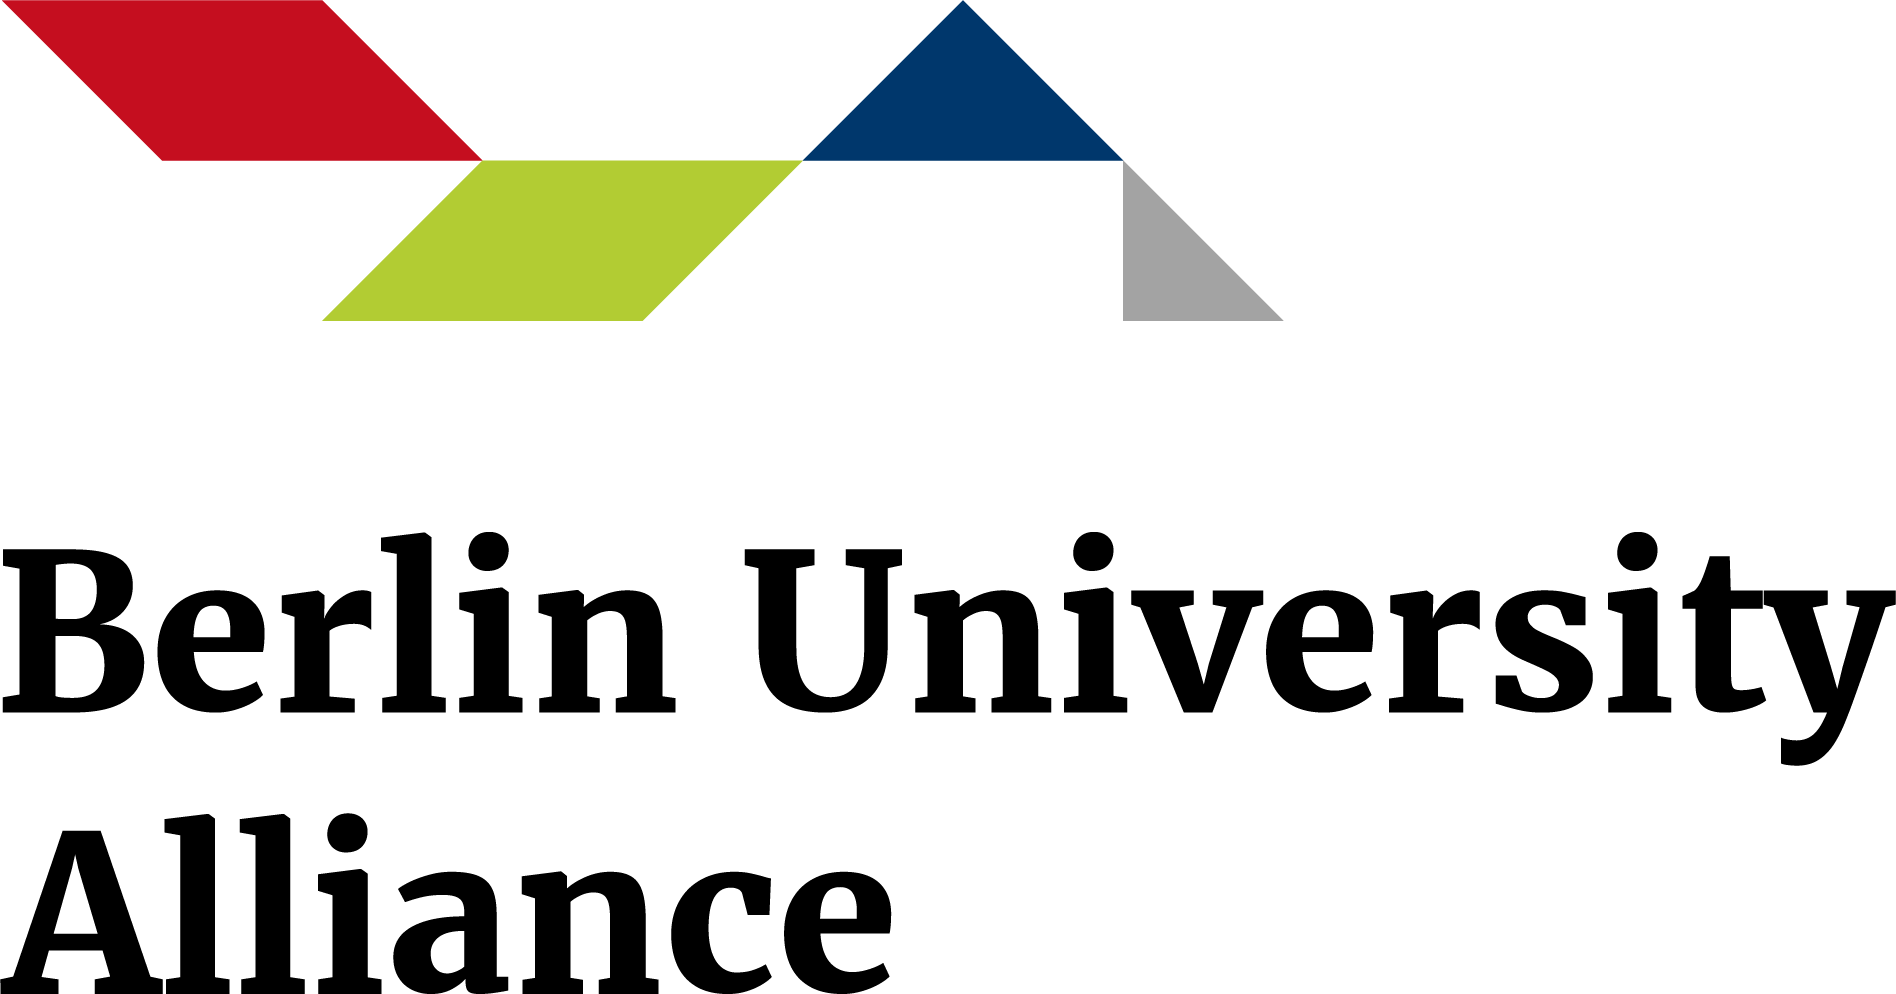 Berlin University Alliance (BAU)